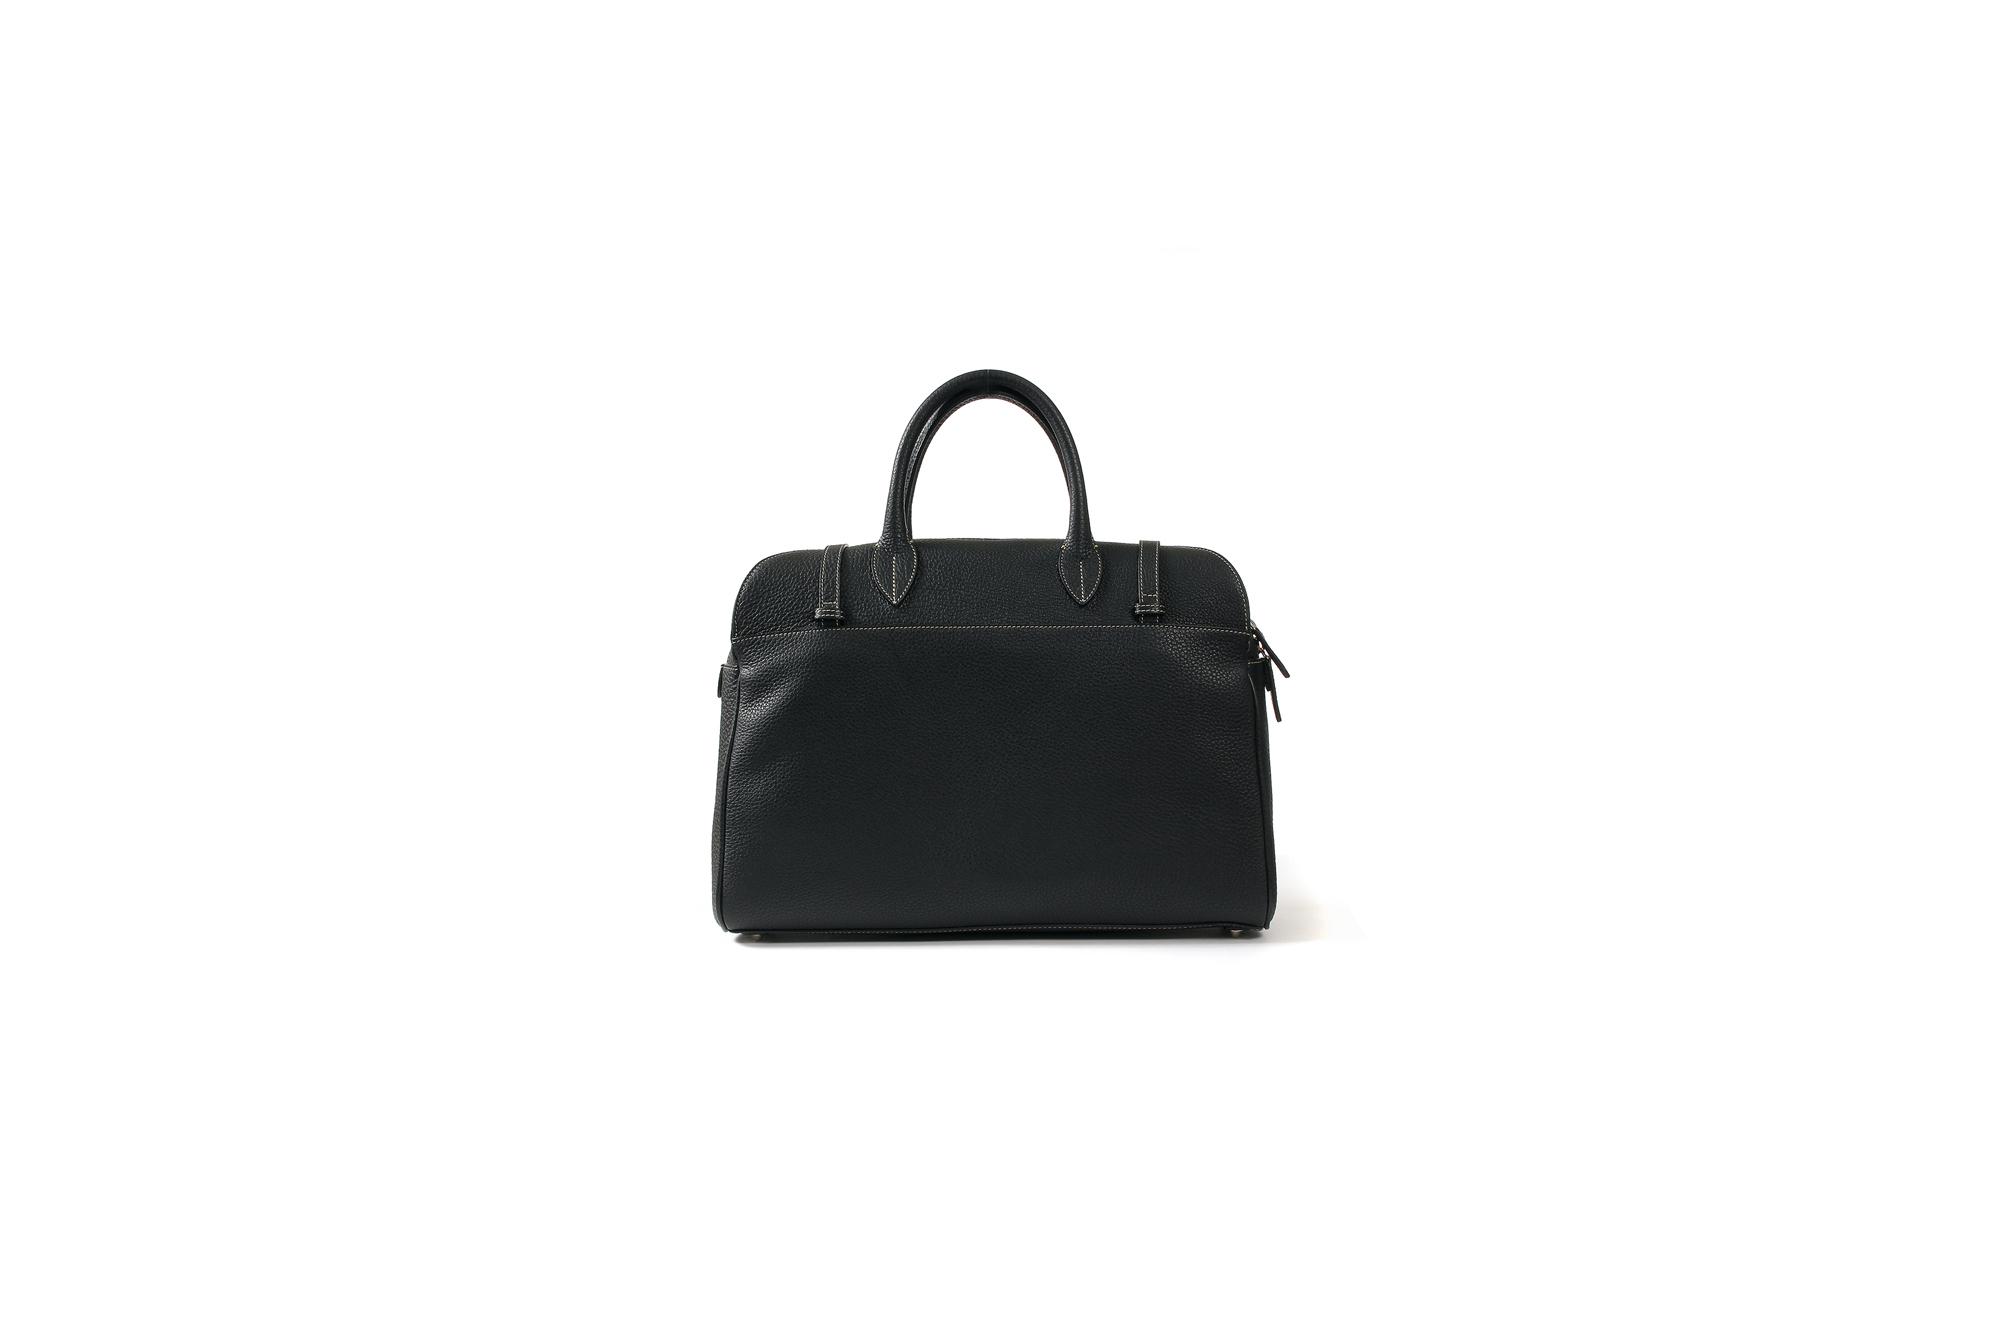 ACATE (アカーテ) AUSTRU (アウストル) Montblanc leather (モンブランレザー) ボストンバッグ NERO (ネロ) MADE IN ITALY (イタリア製) 2020 春夏新作  愛知 名古屋 altoediritto アルトエデリット